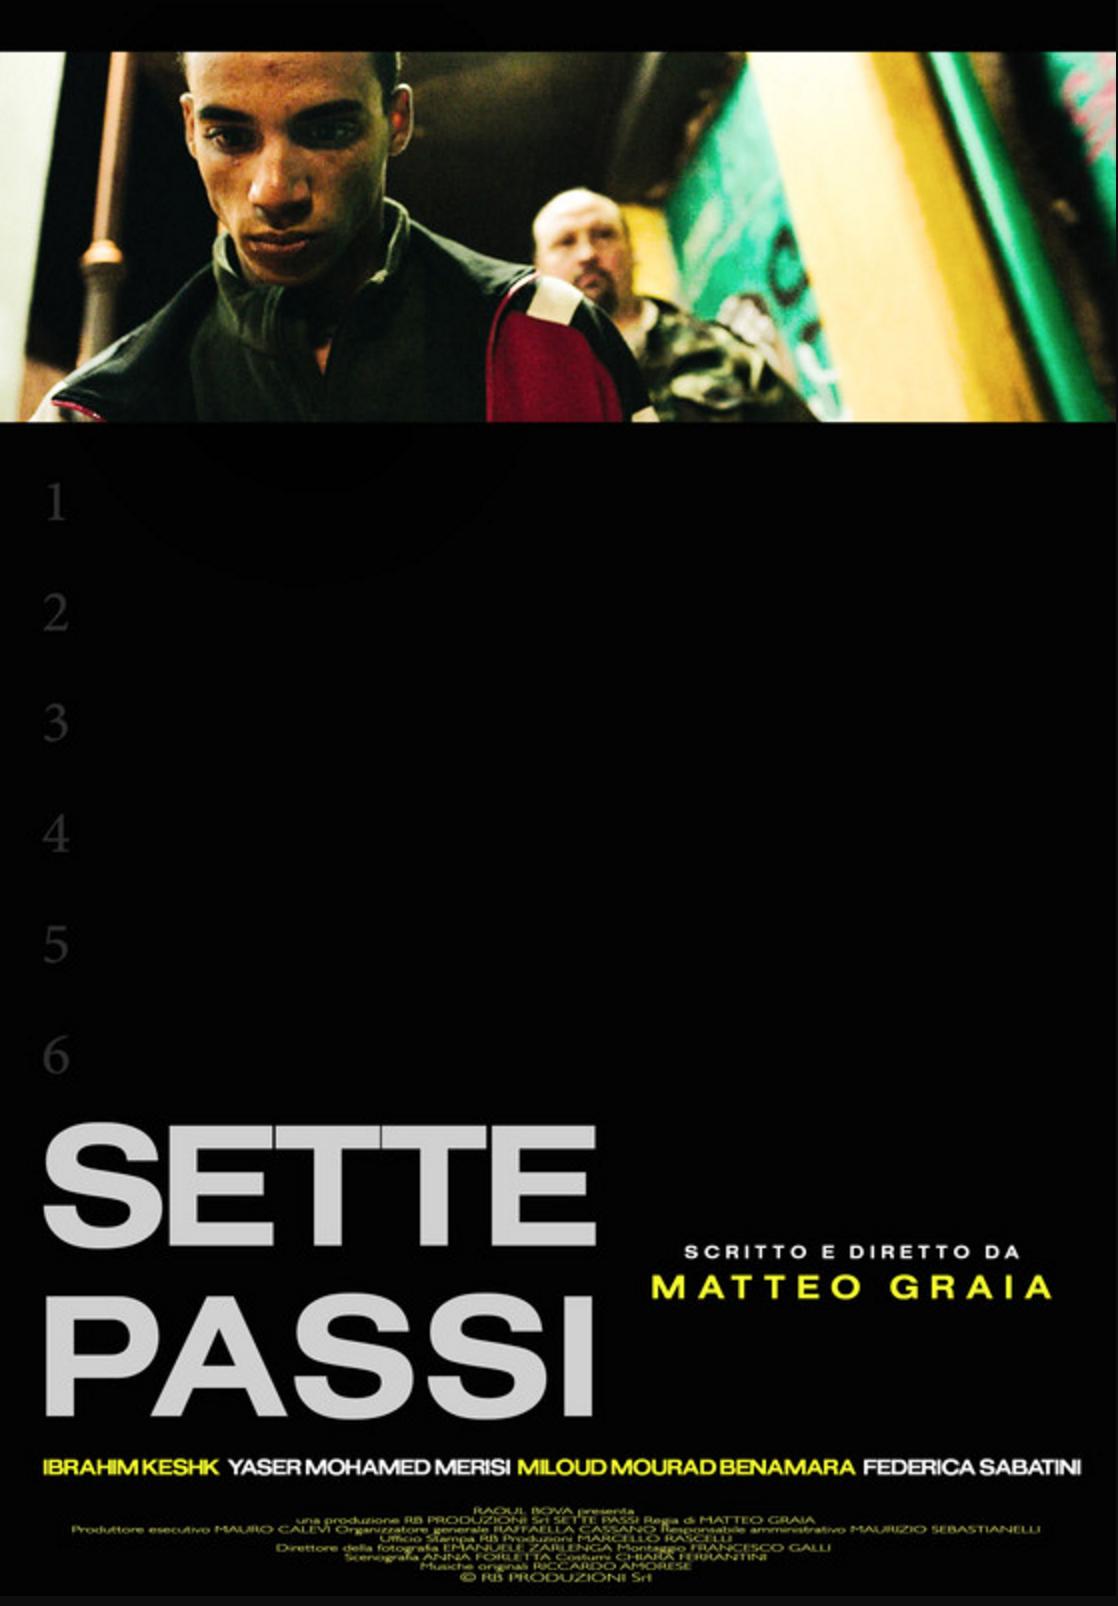 Sette passi locandina roma creative contest